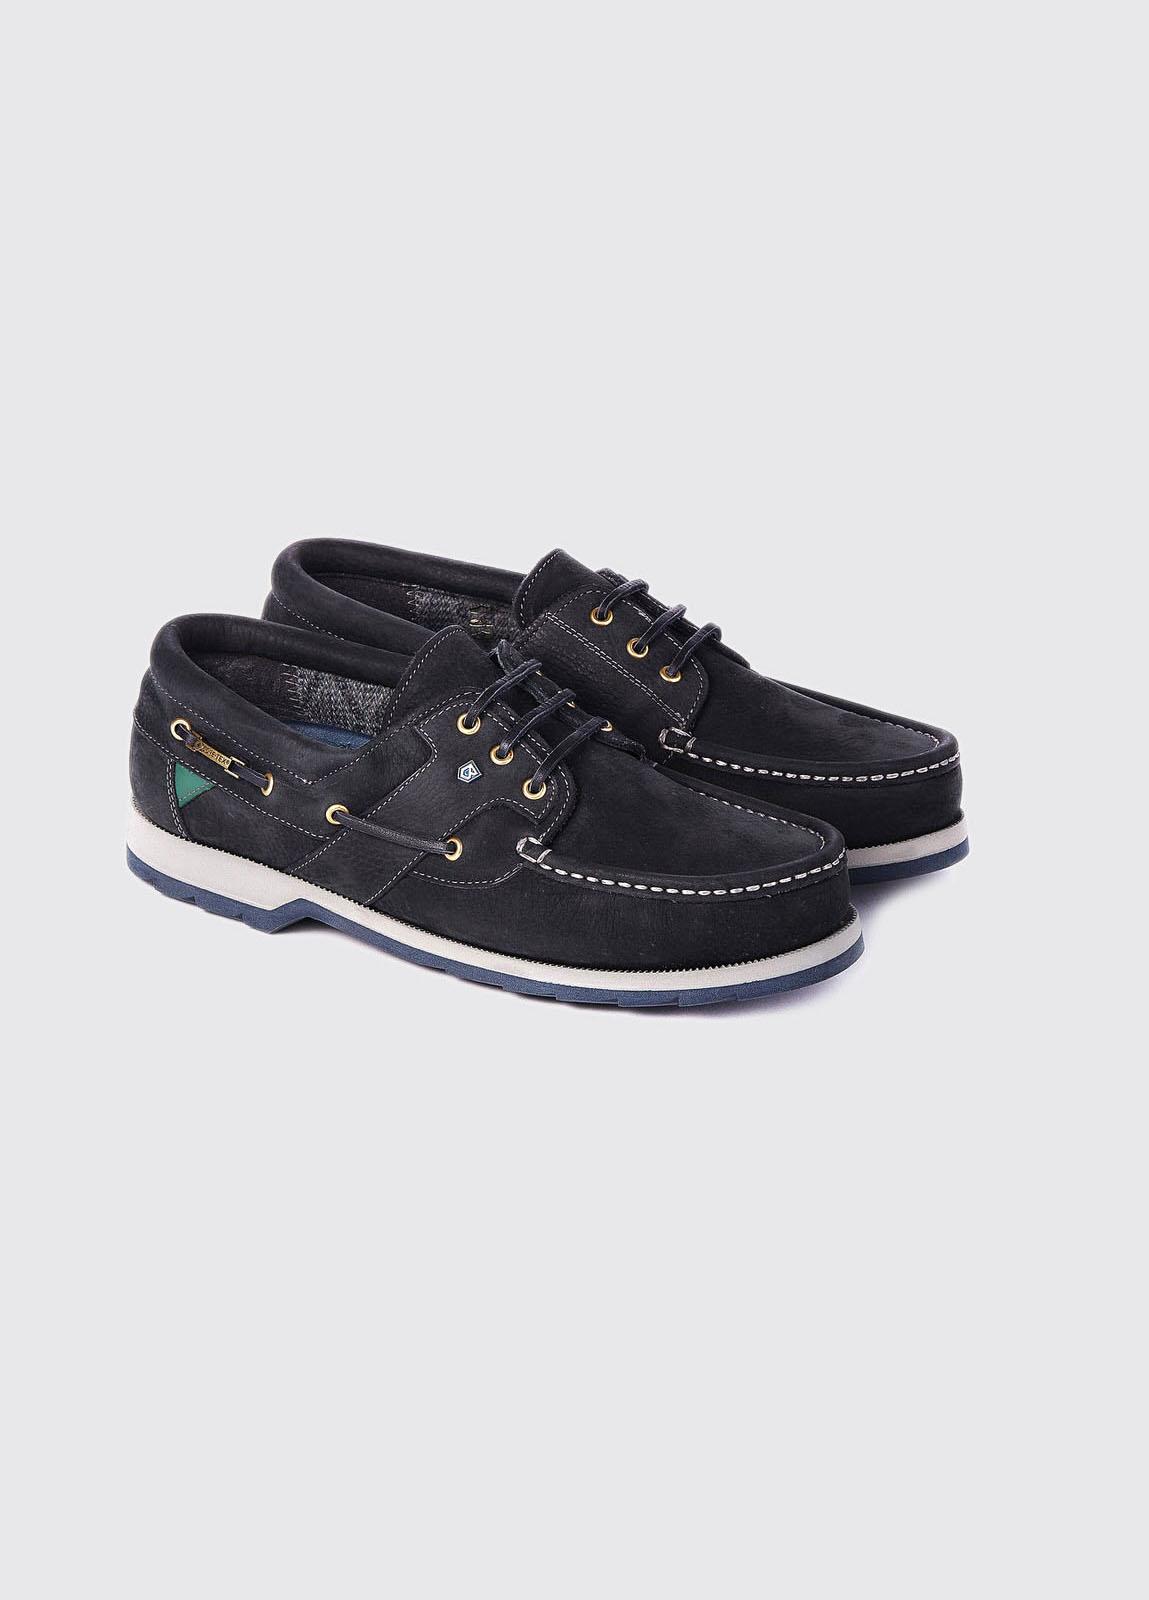 Clipper Deck Shoe - Navy